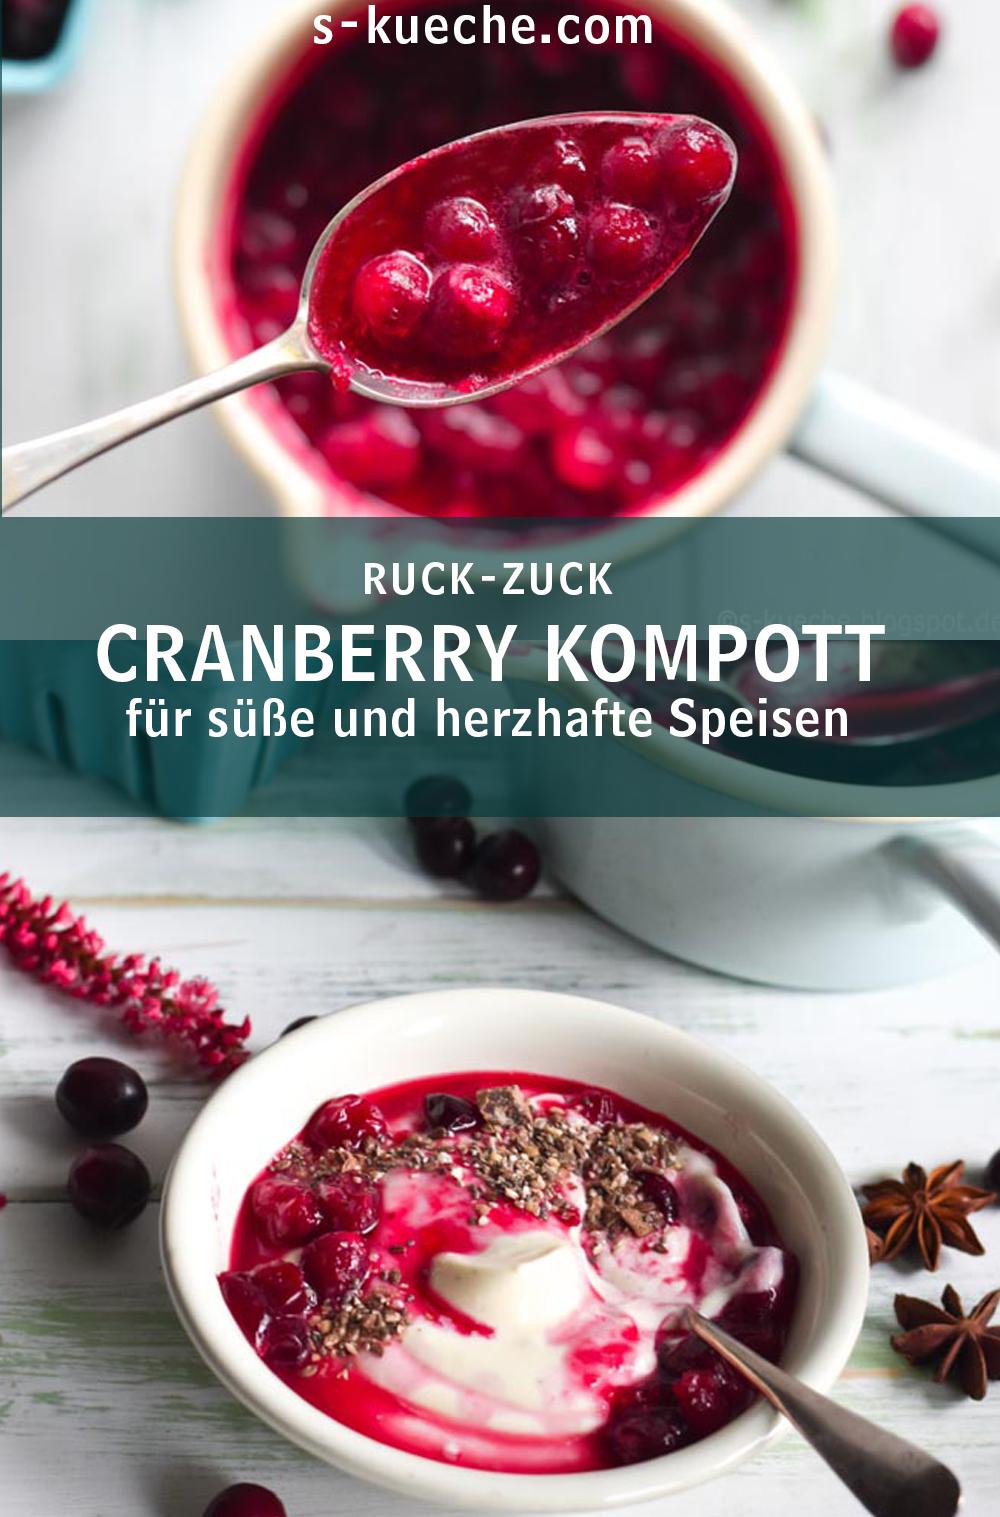 Cranberry Sauce - Cranberry Kompott